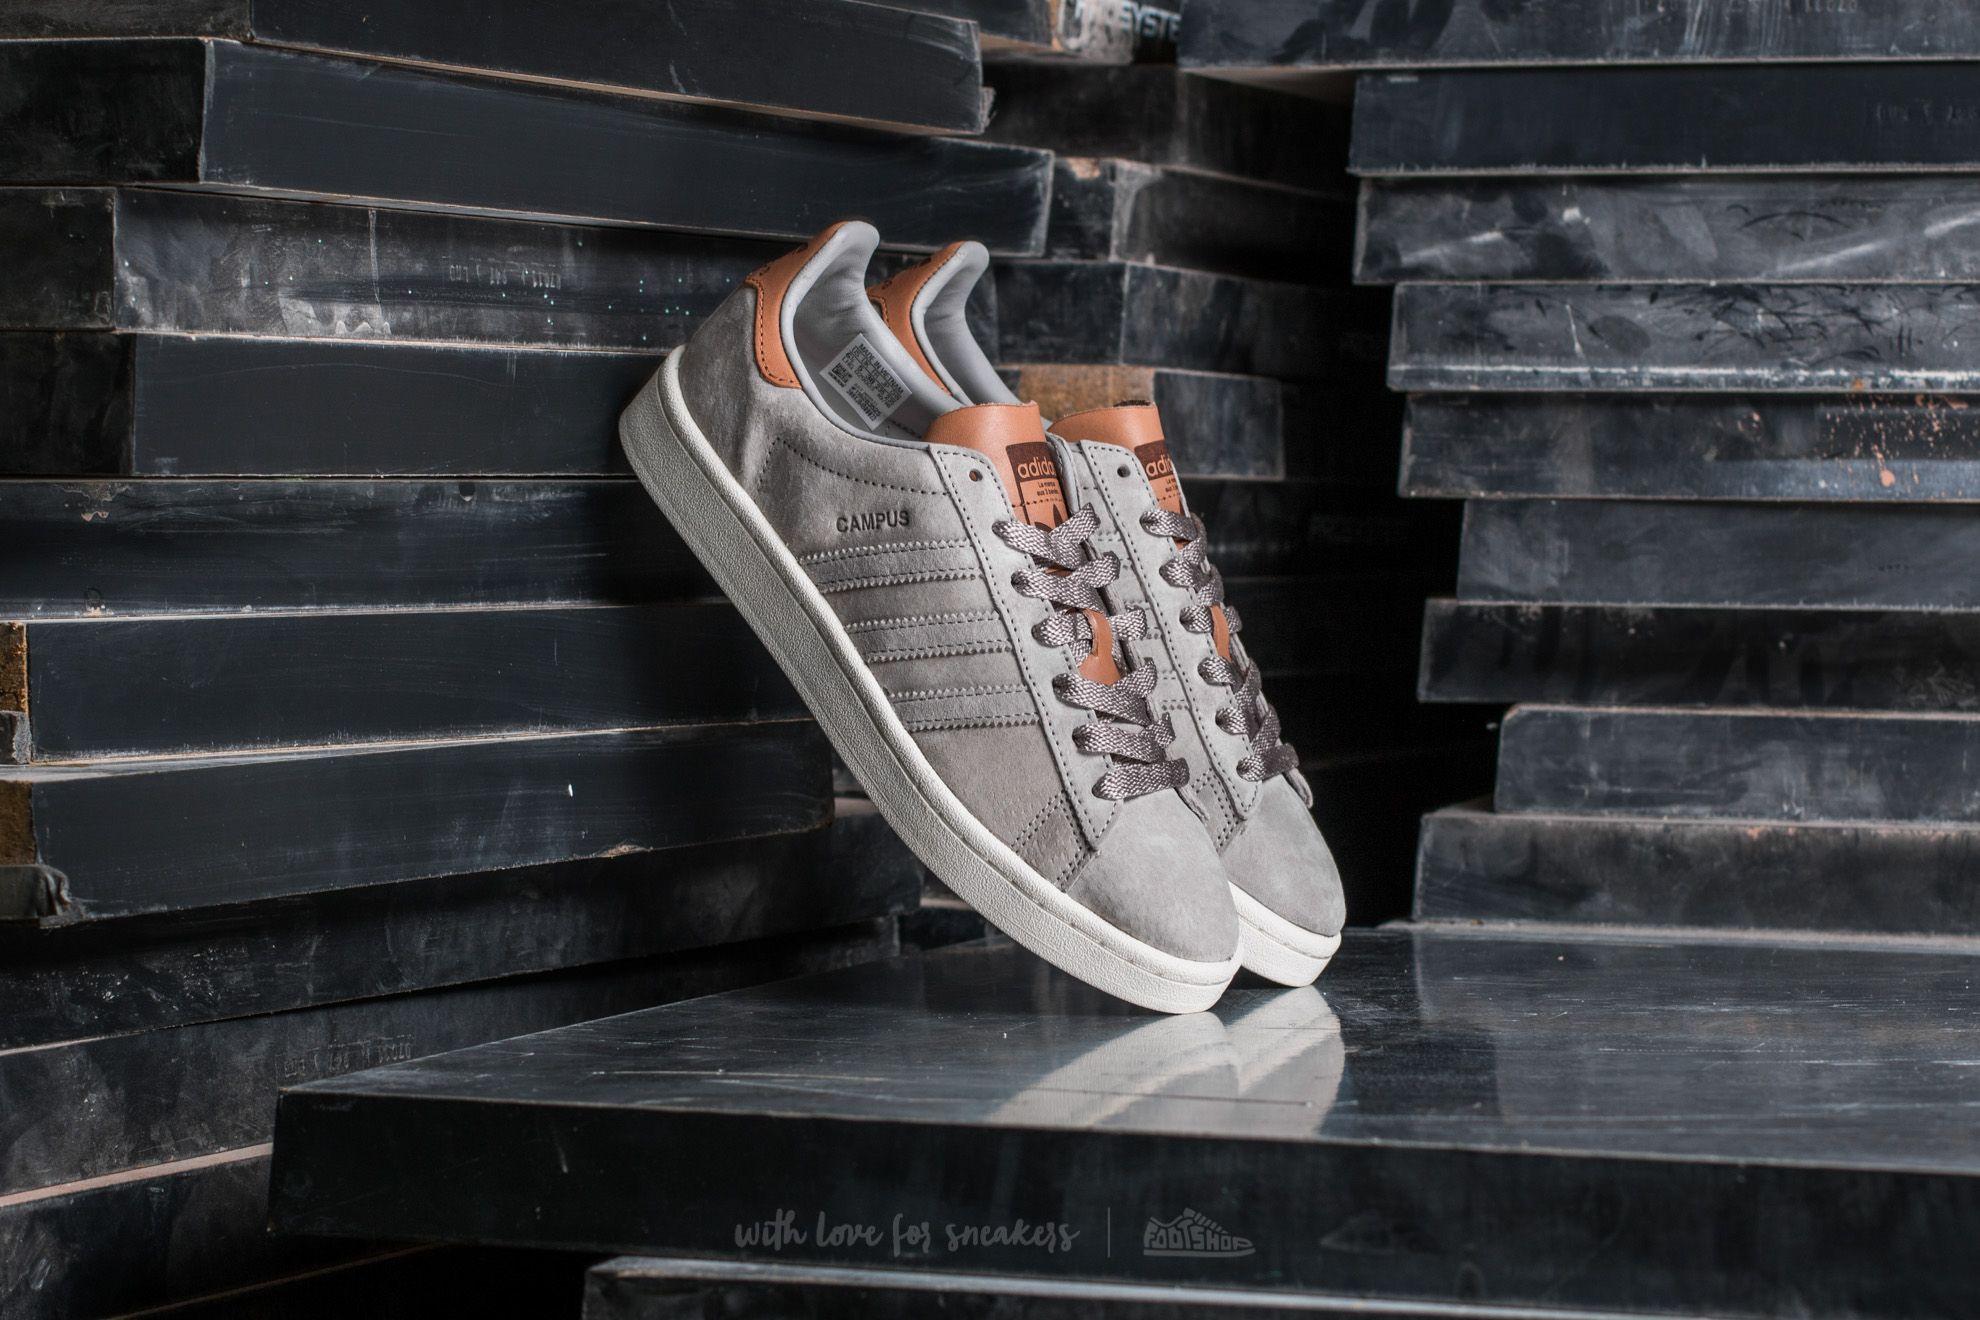 adidas Campus W Clear Granite Clear Granite Supplier | Footshop